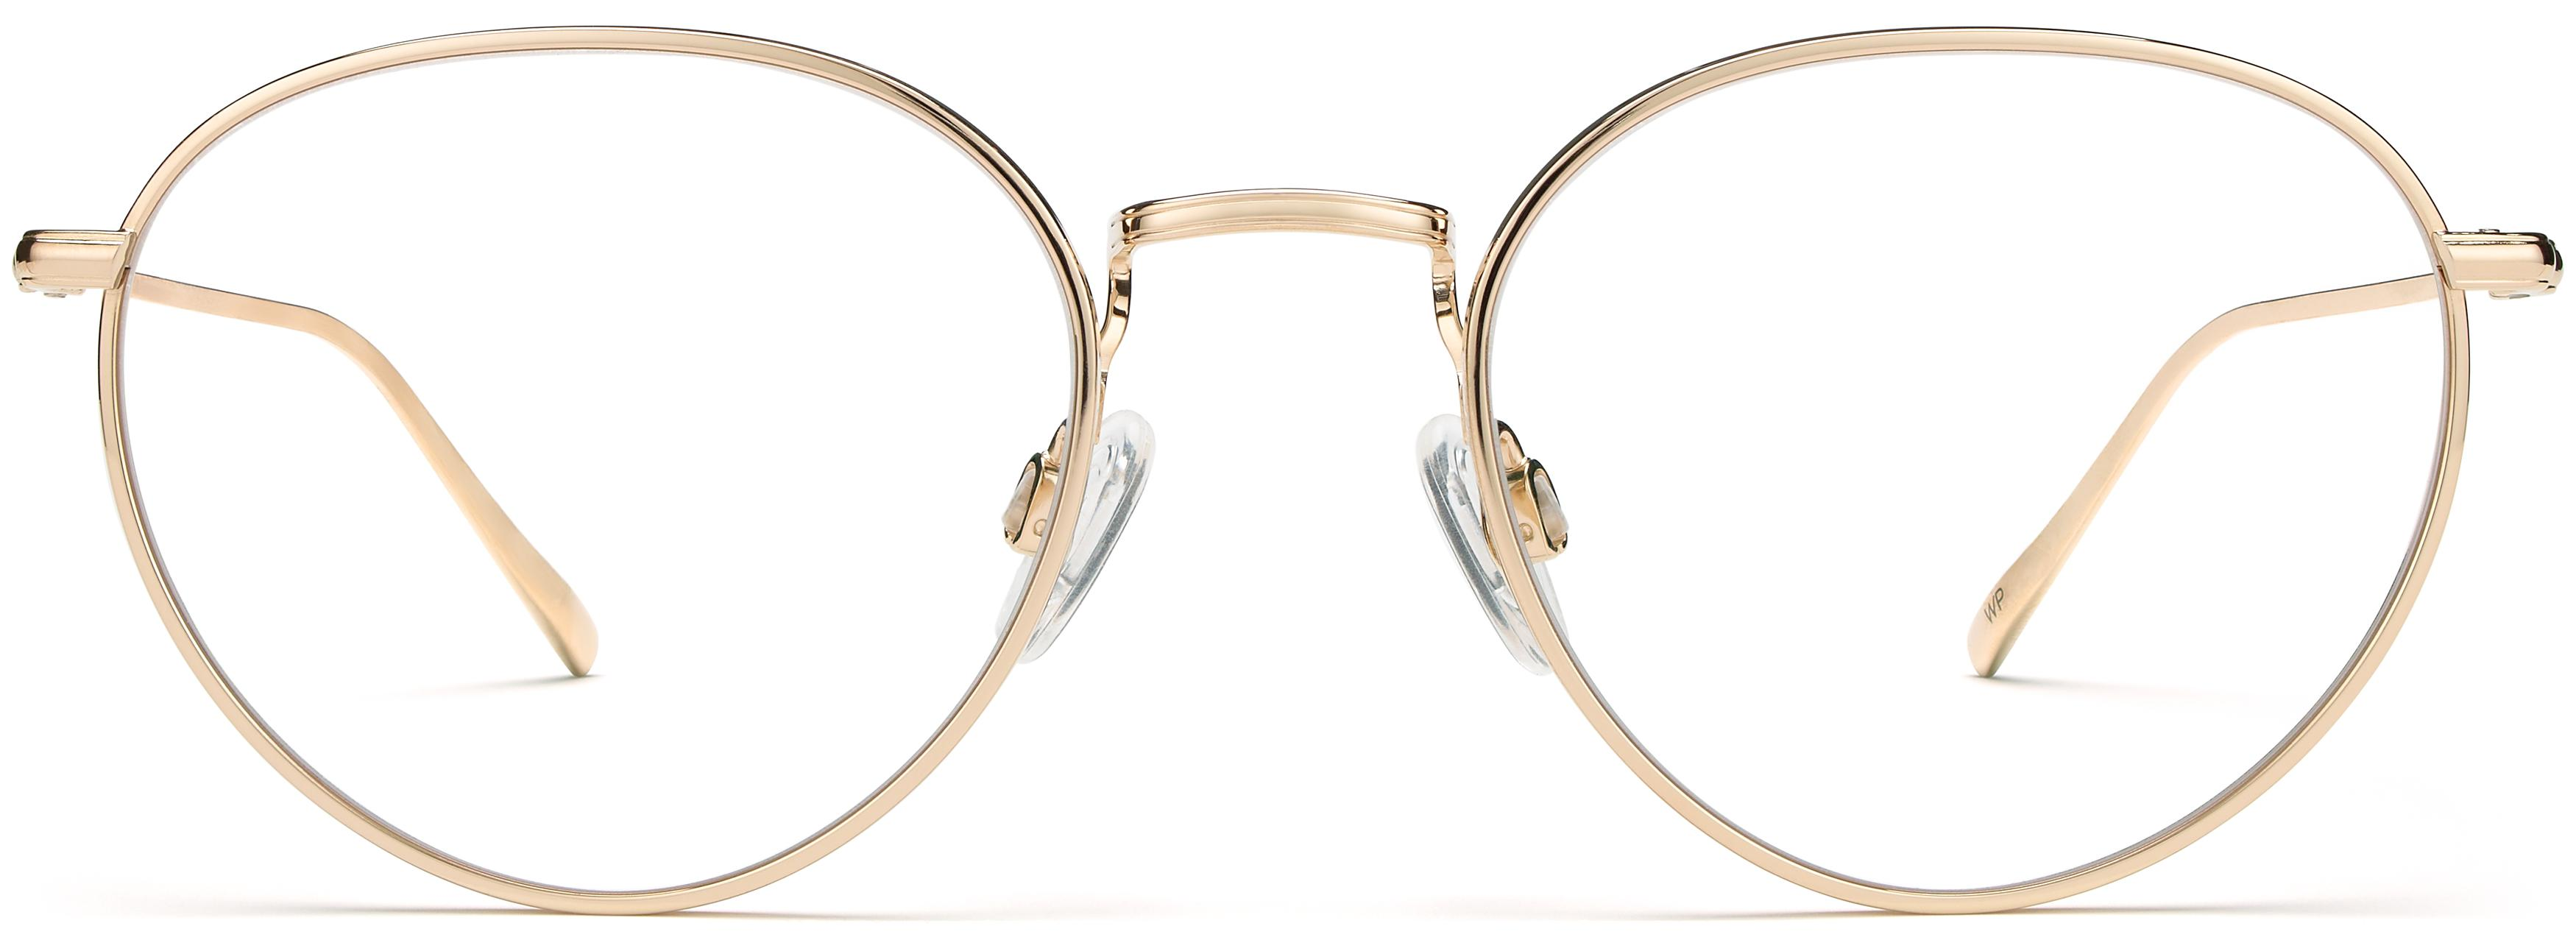 fd3936a86d7b Women s Eyeglasses